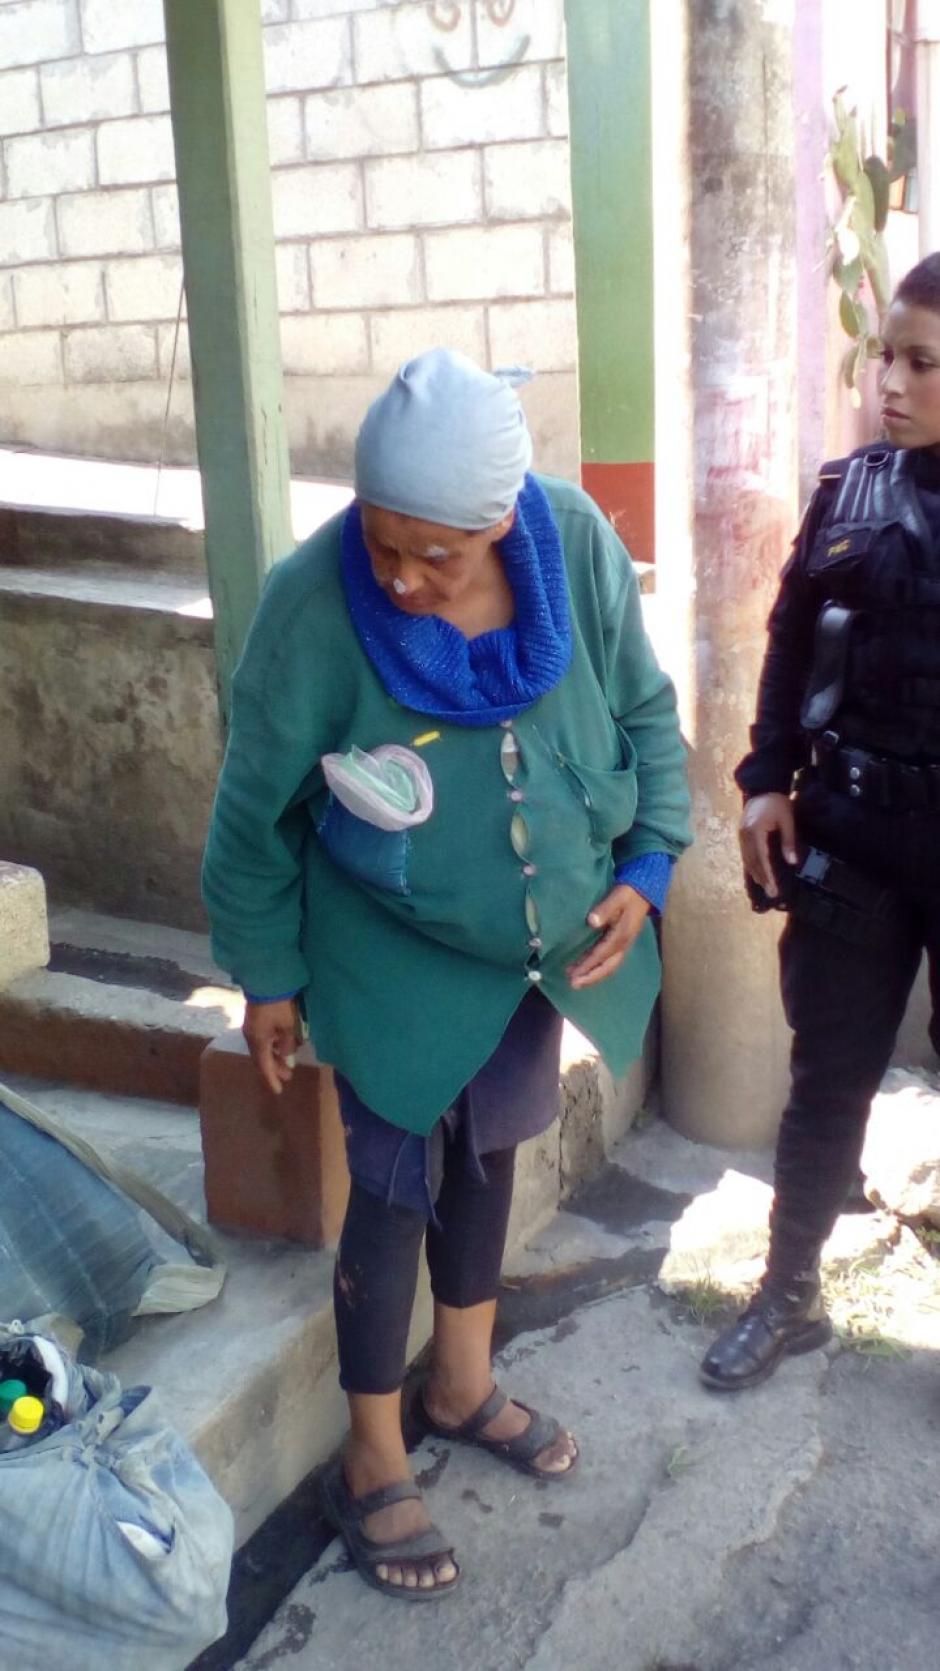 El Miércoles Santo, la PNC informó de la localización de la mexicana. (Foto: PNC)